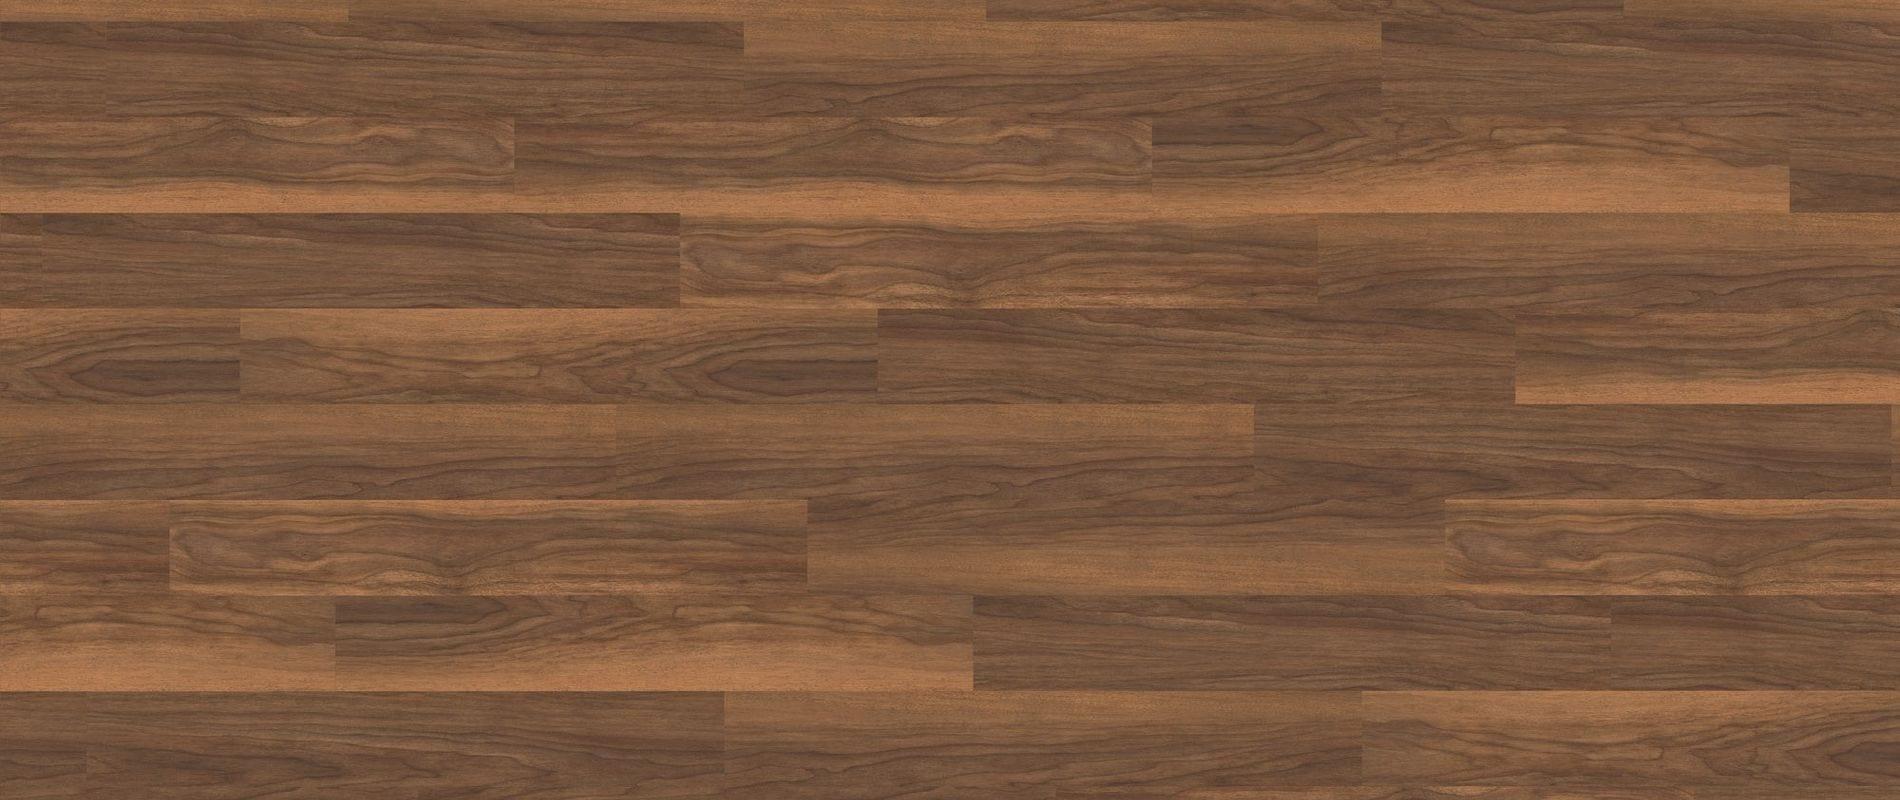 klick vinyl in holzoptik walnuss bis zu 50 sparen. Black Bedroom Furniture Sets. Home Design Ideas